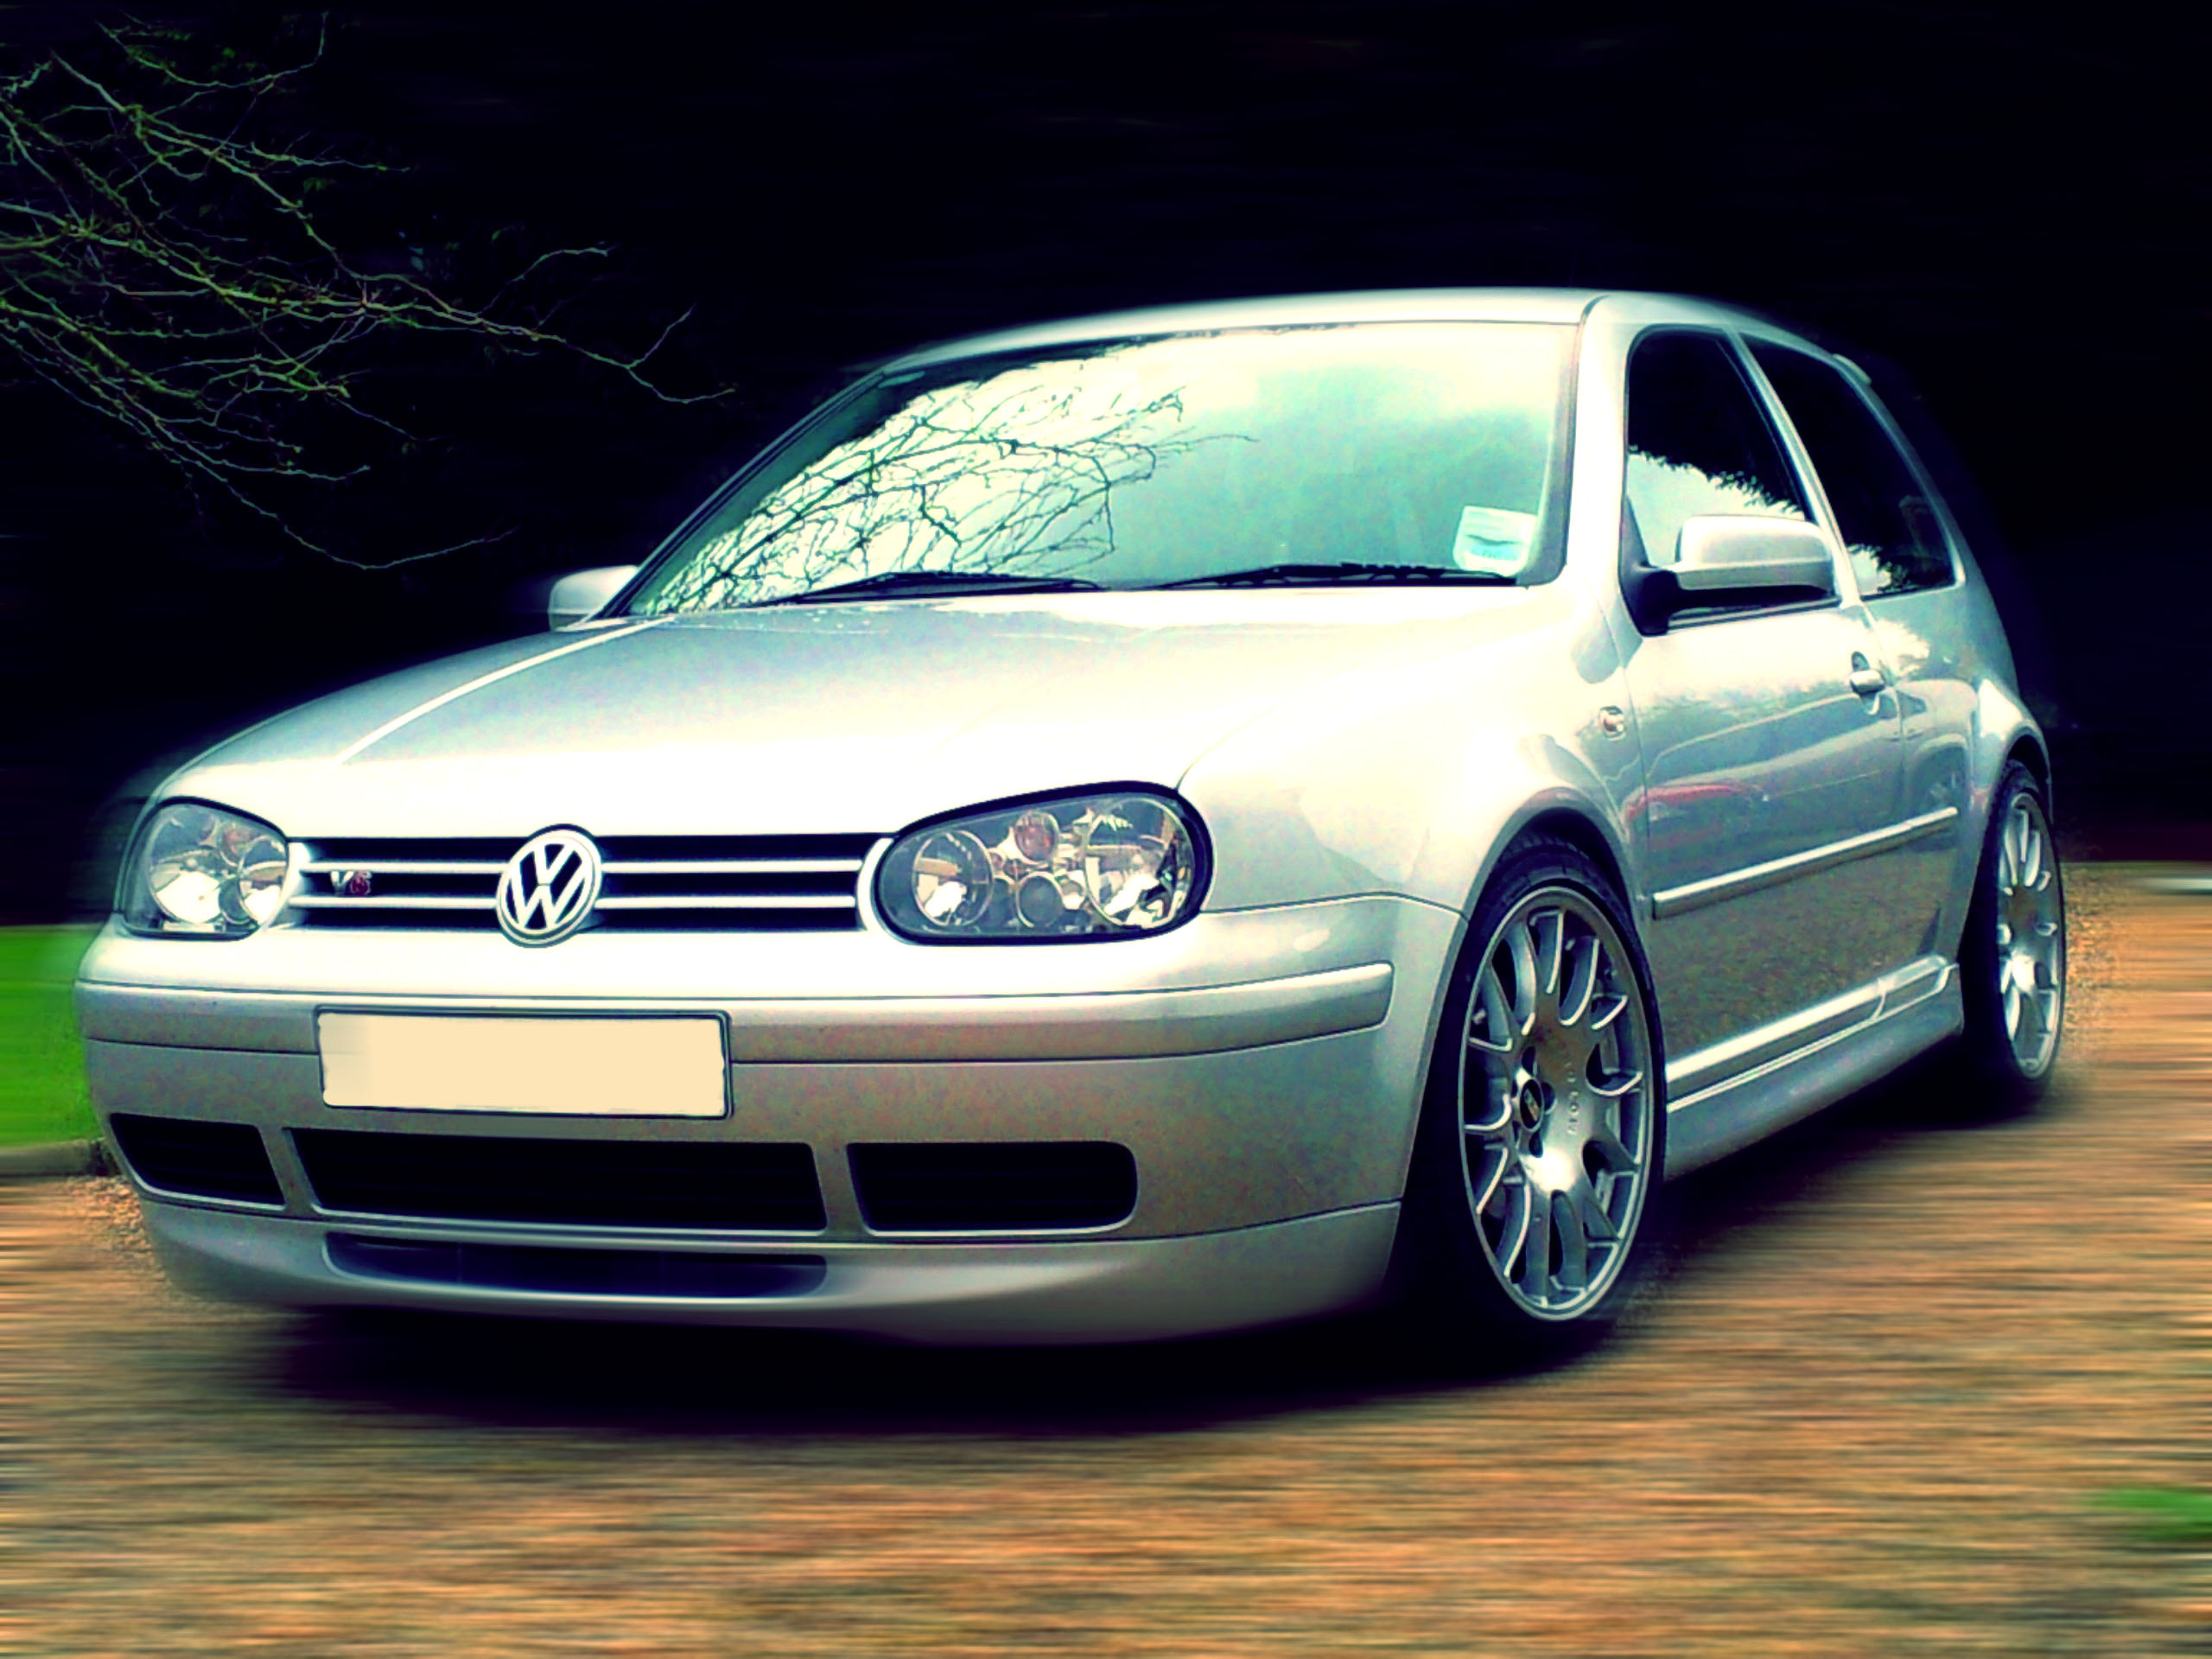 Volkswagen Golf 2.8 V6 4motion